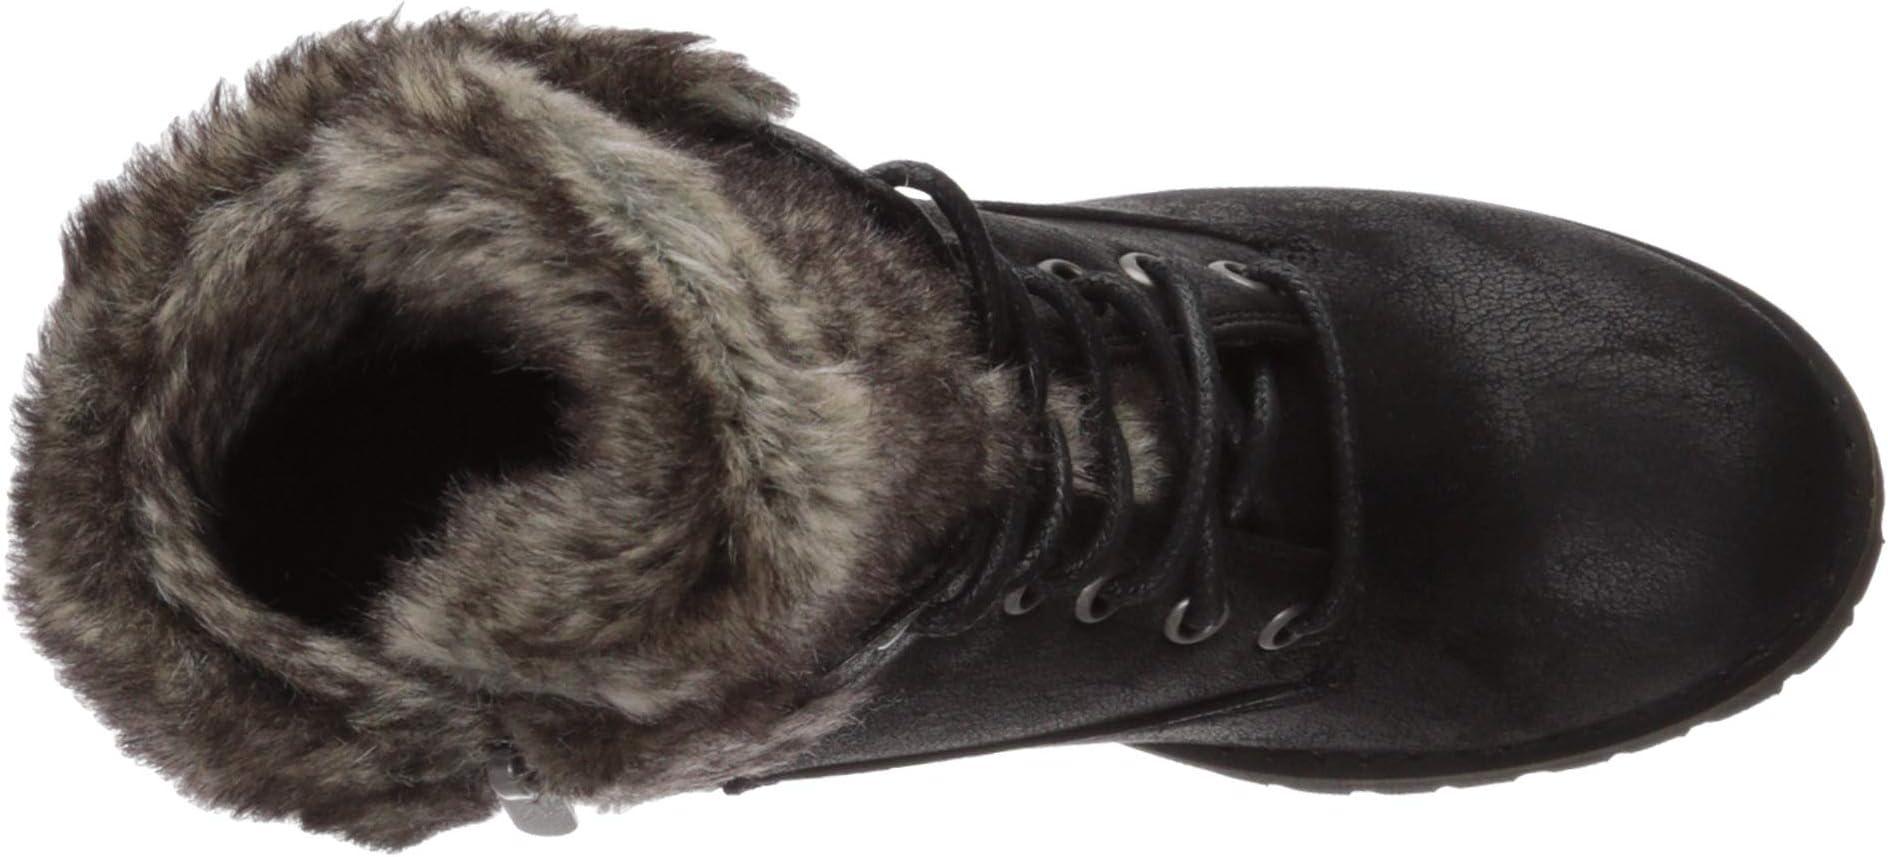 CARLOS by Carlos Santana Gabby   Women's shoes   2020 Newest